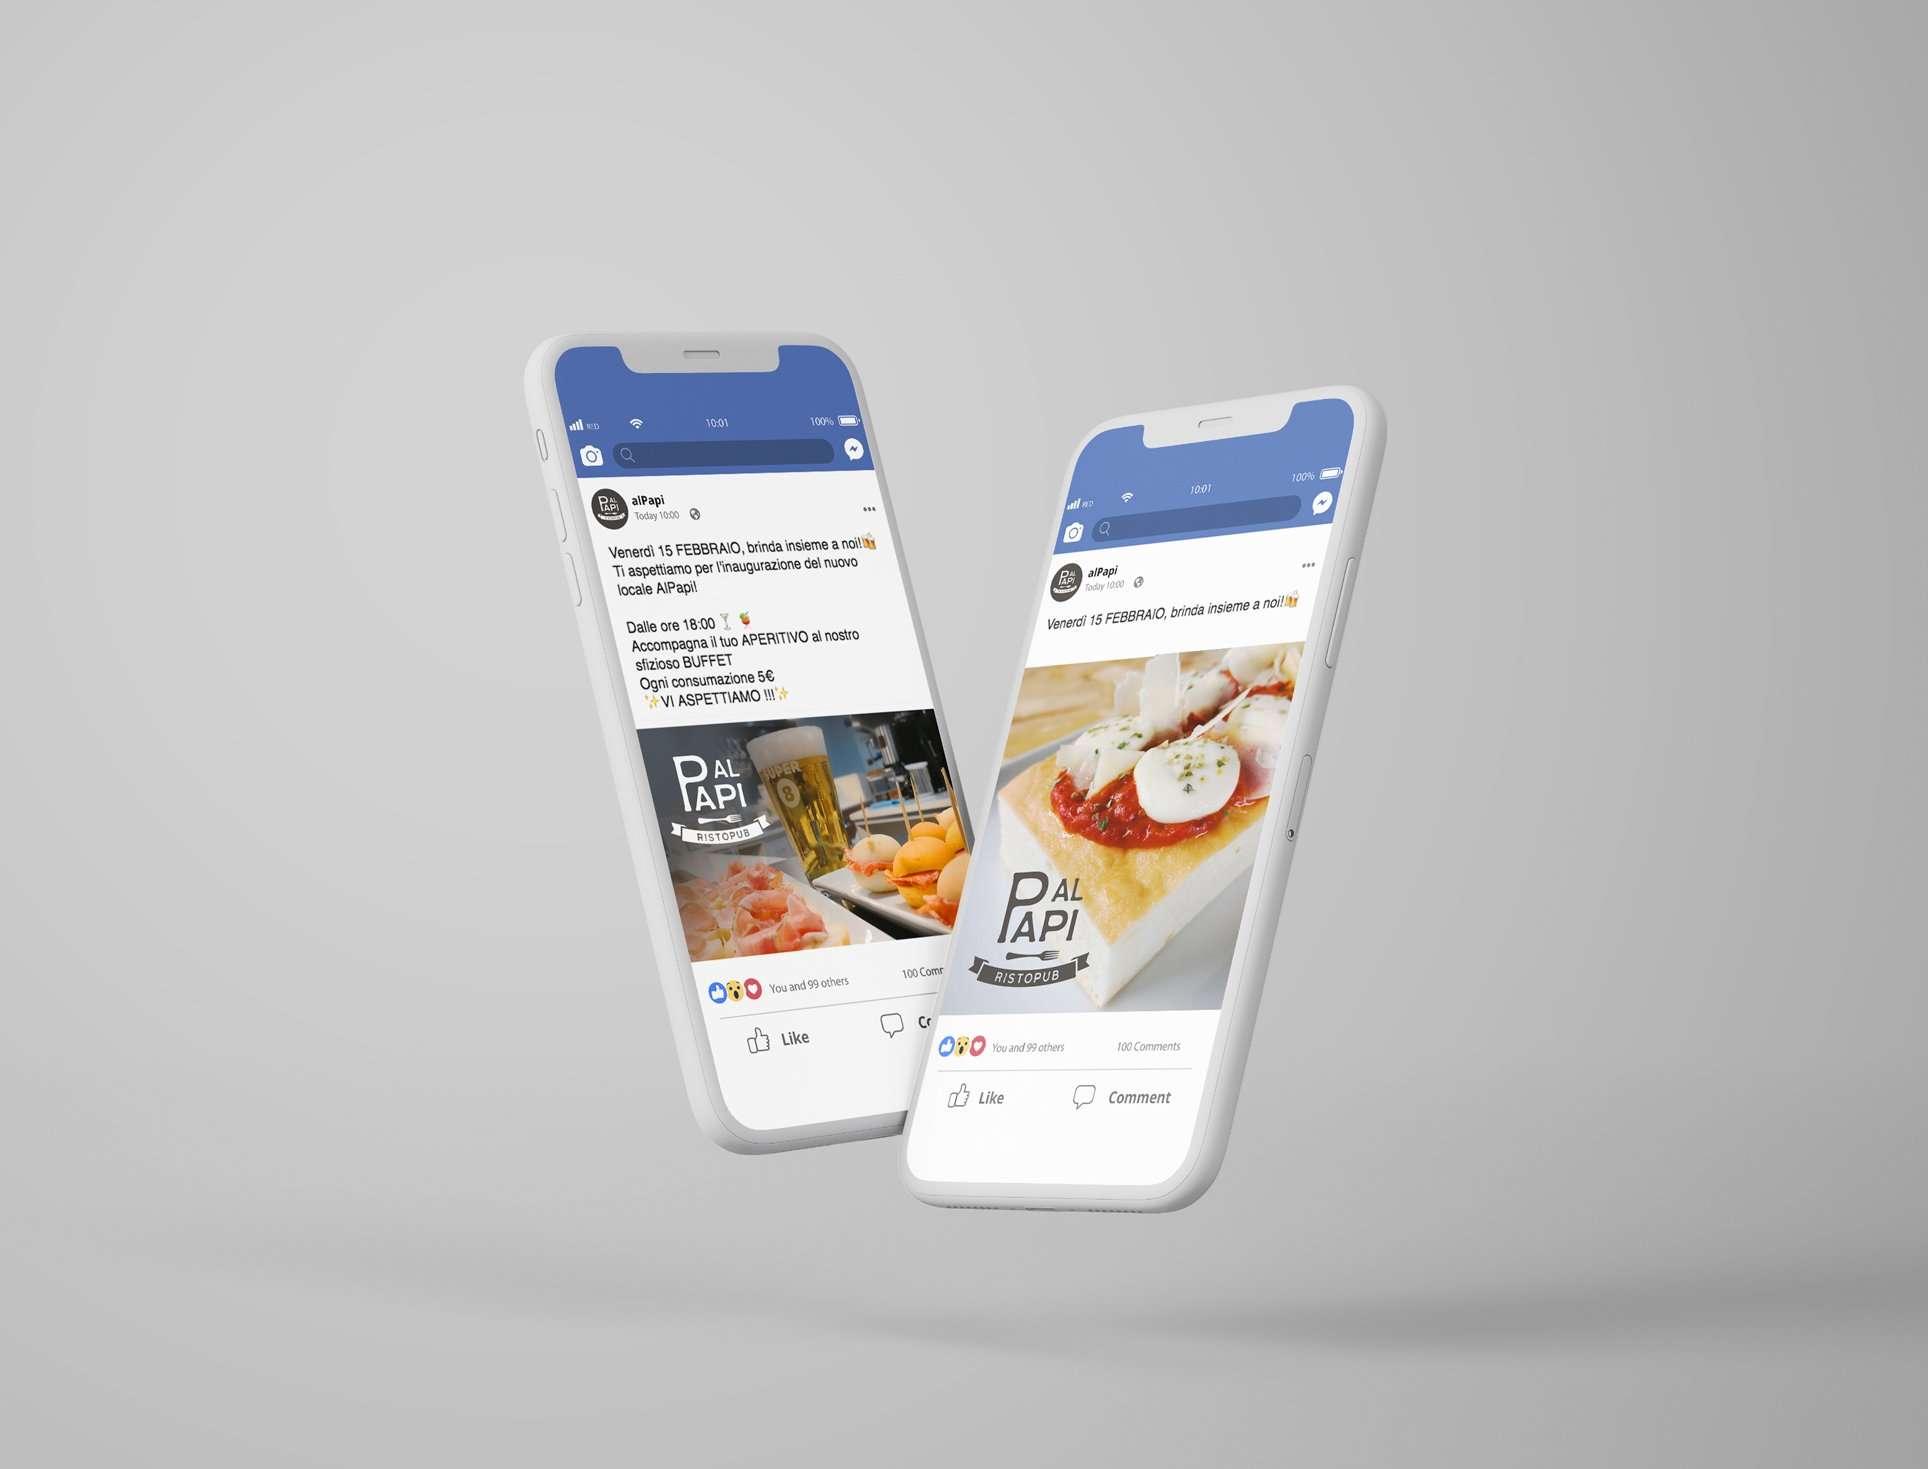 alpapi facebook